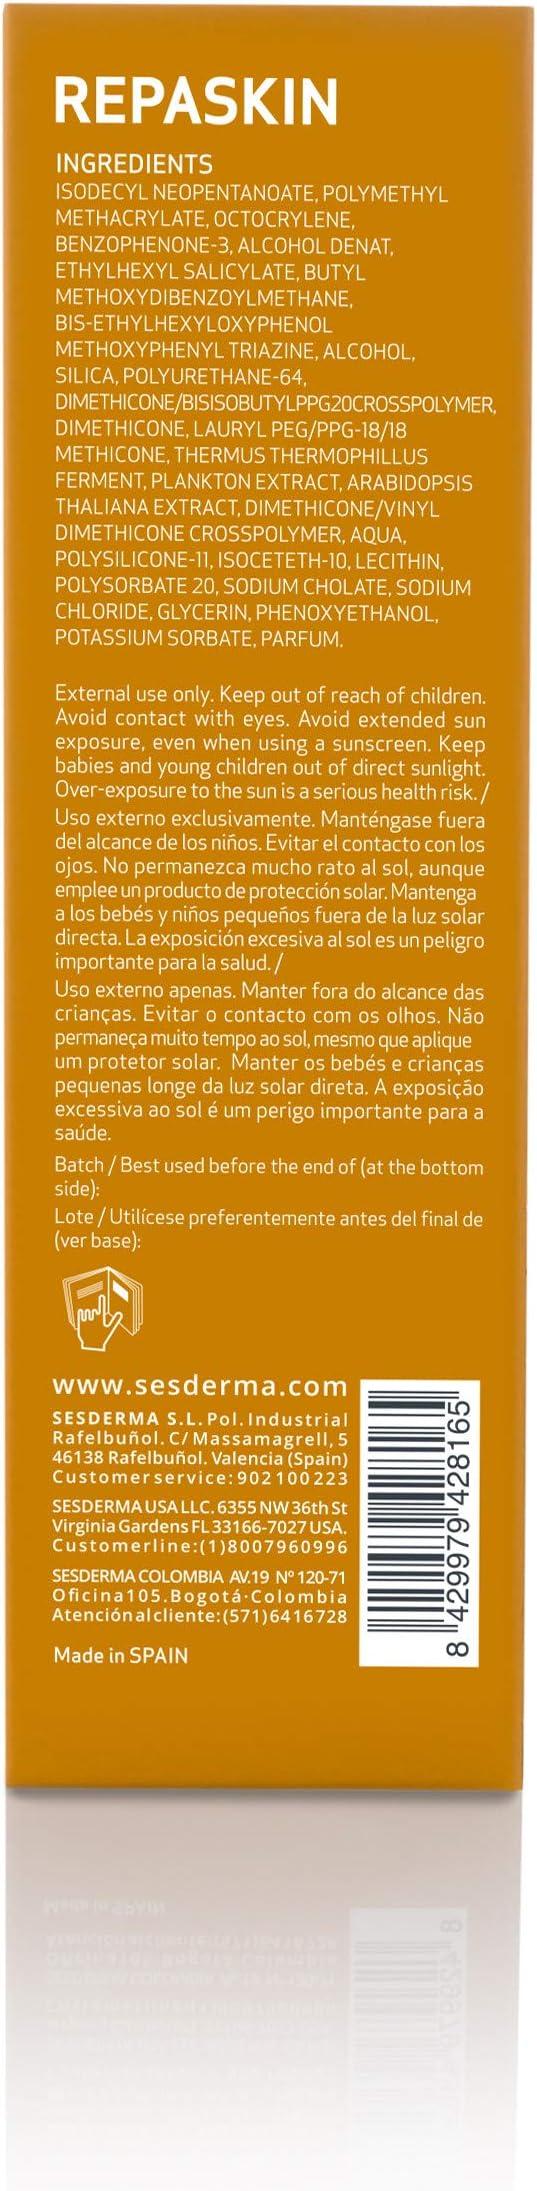 SESDERMA Repaskin Protector Solar Facial SPF 50 Tacto Seda - 50 gr